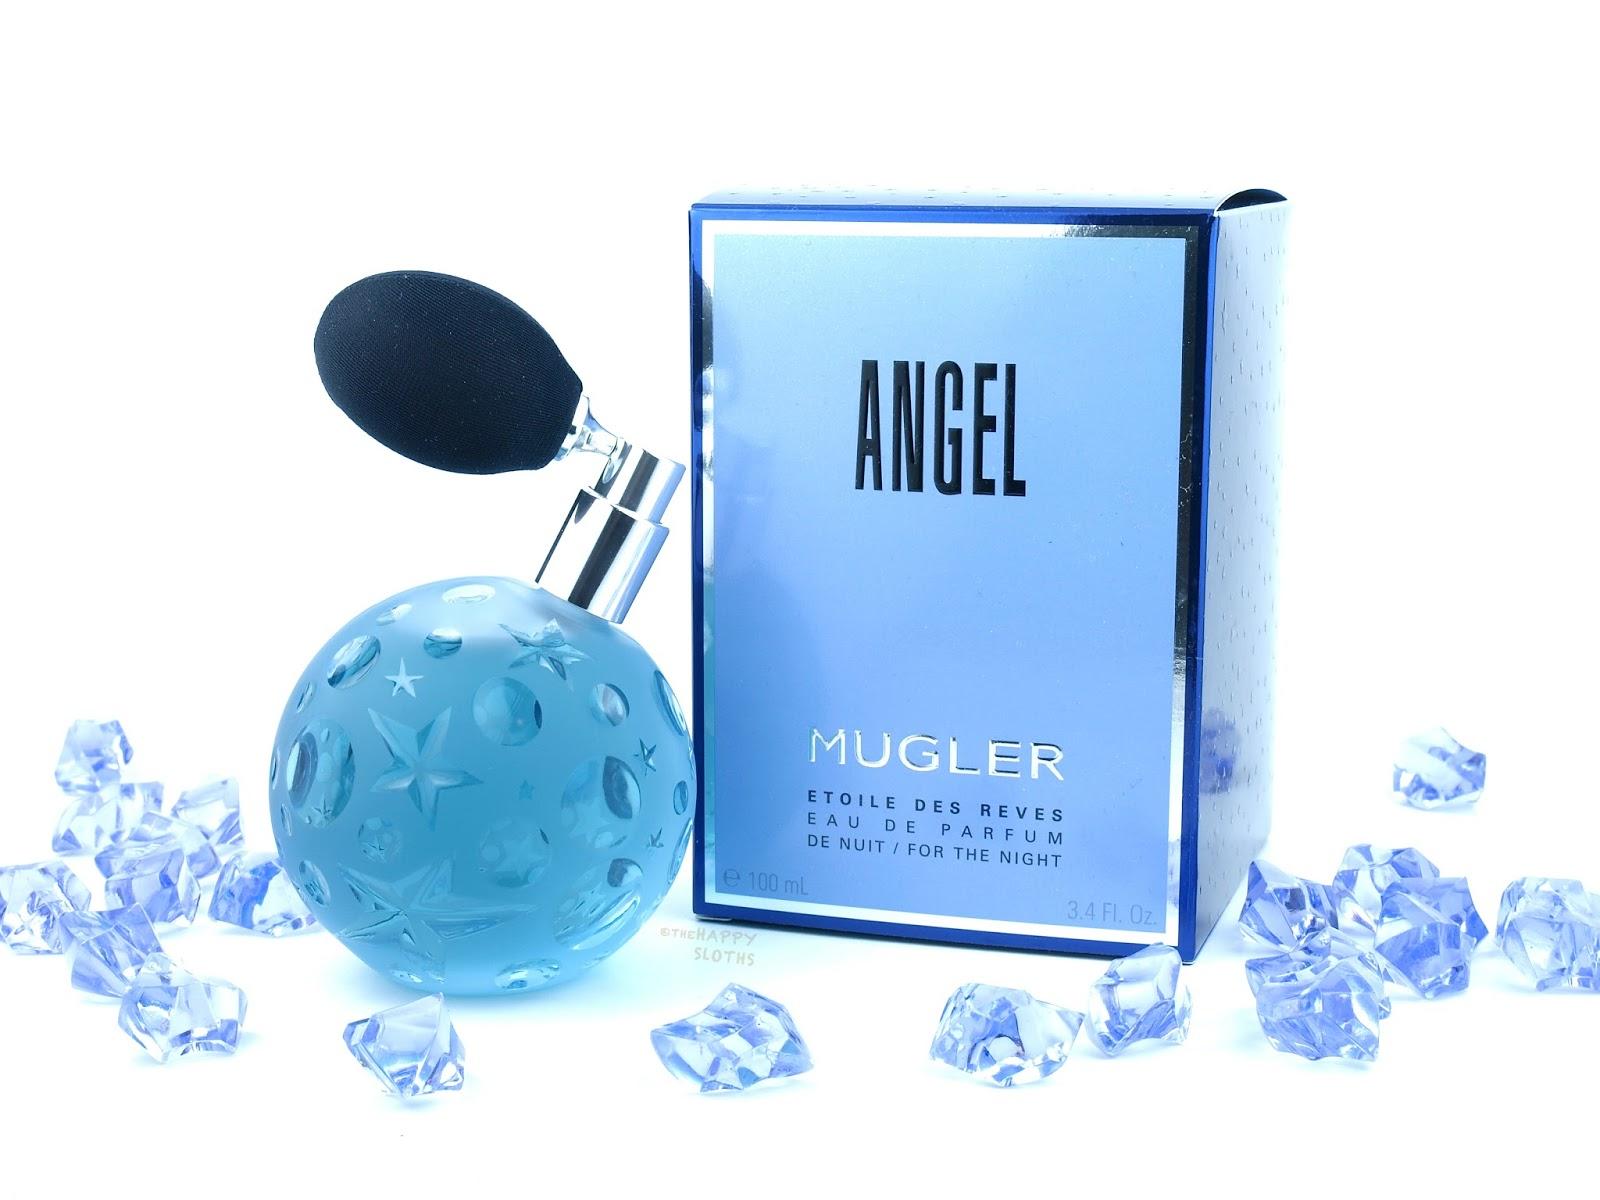 Mugler Angel Étoile Des Rêves Review